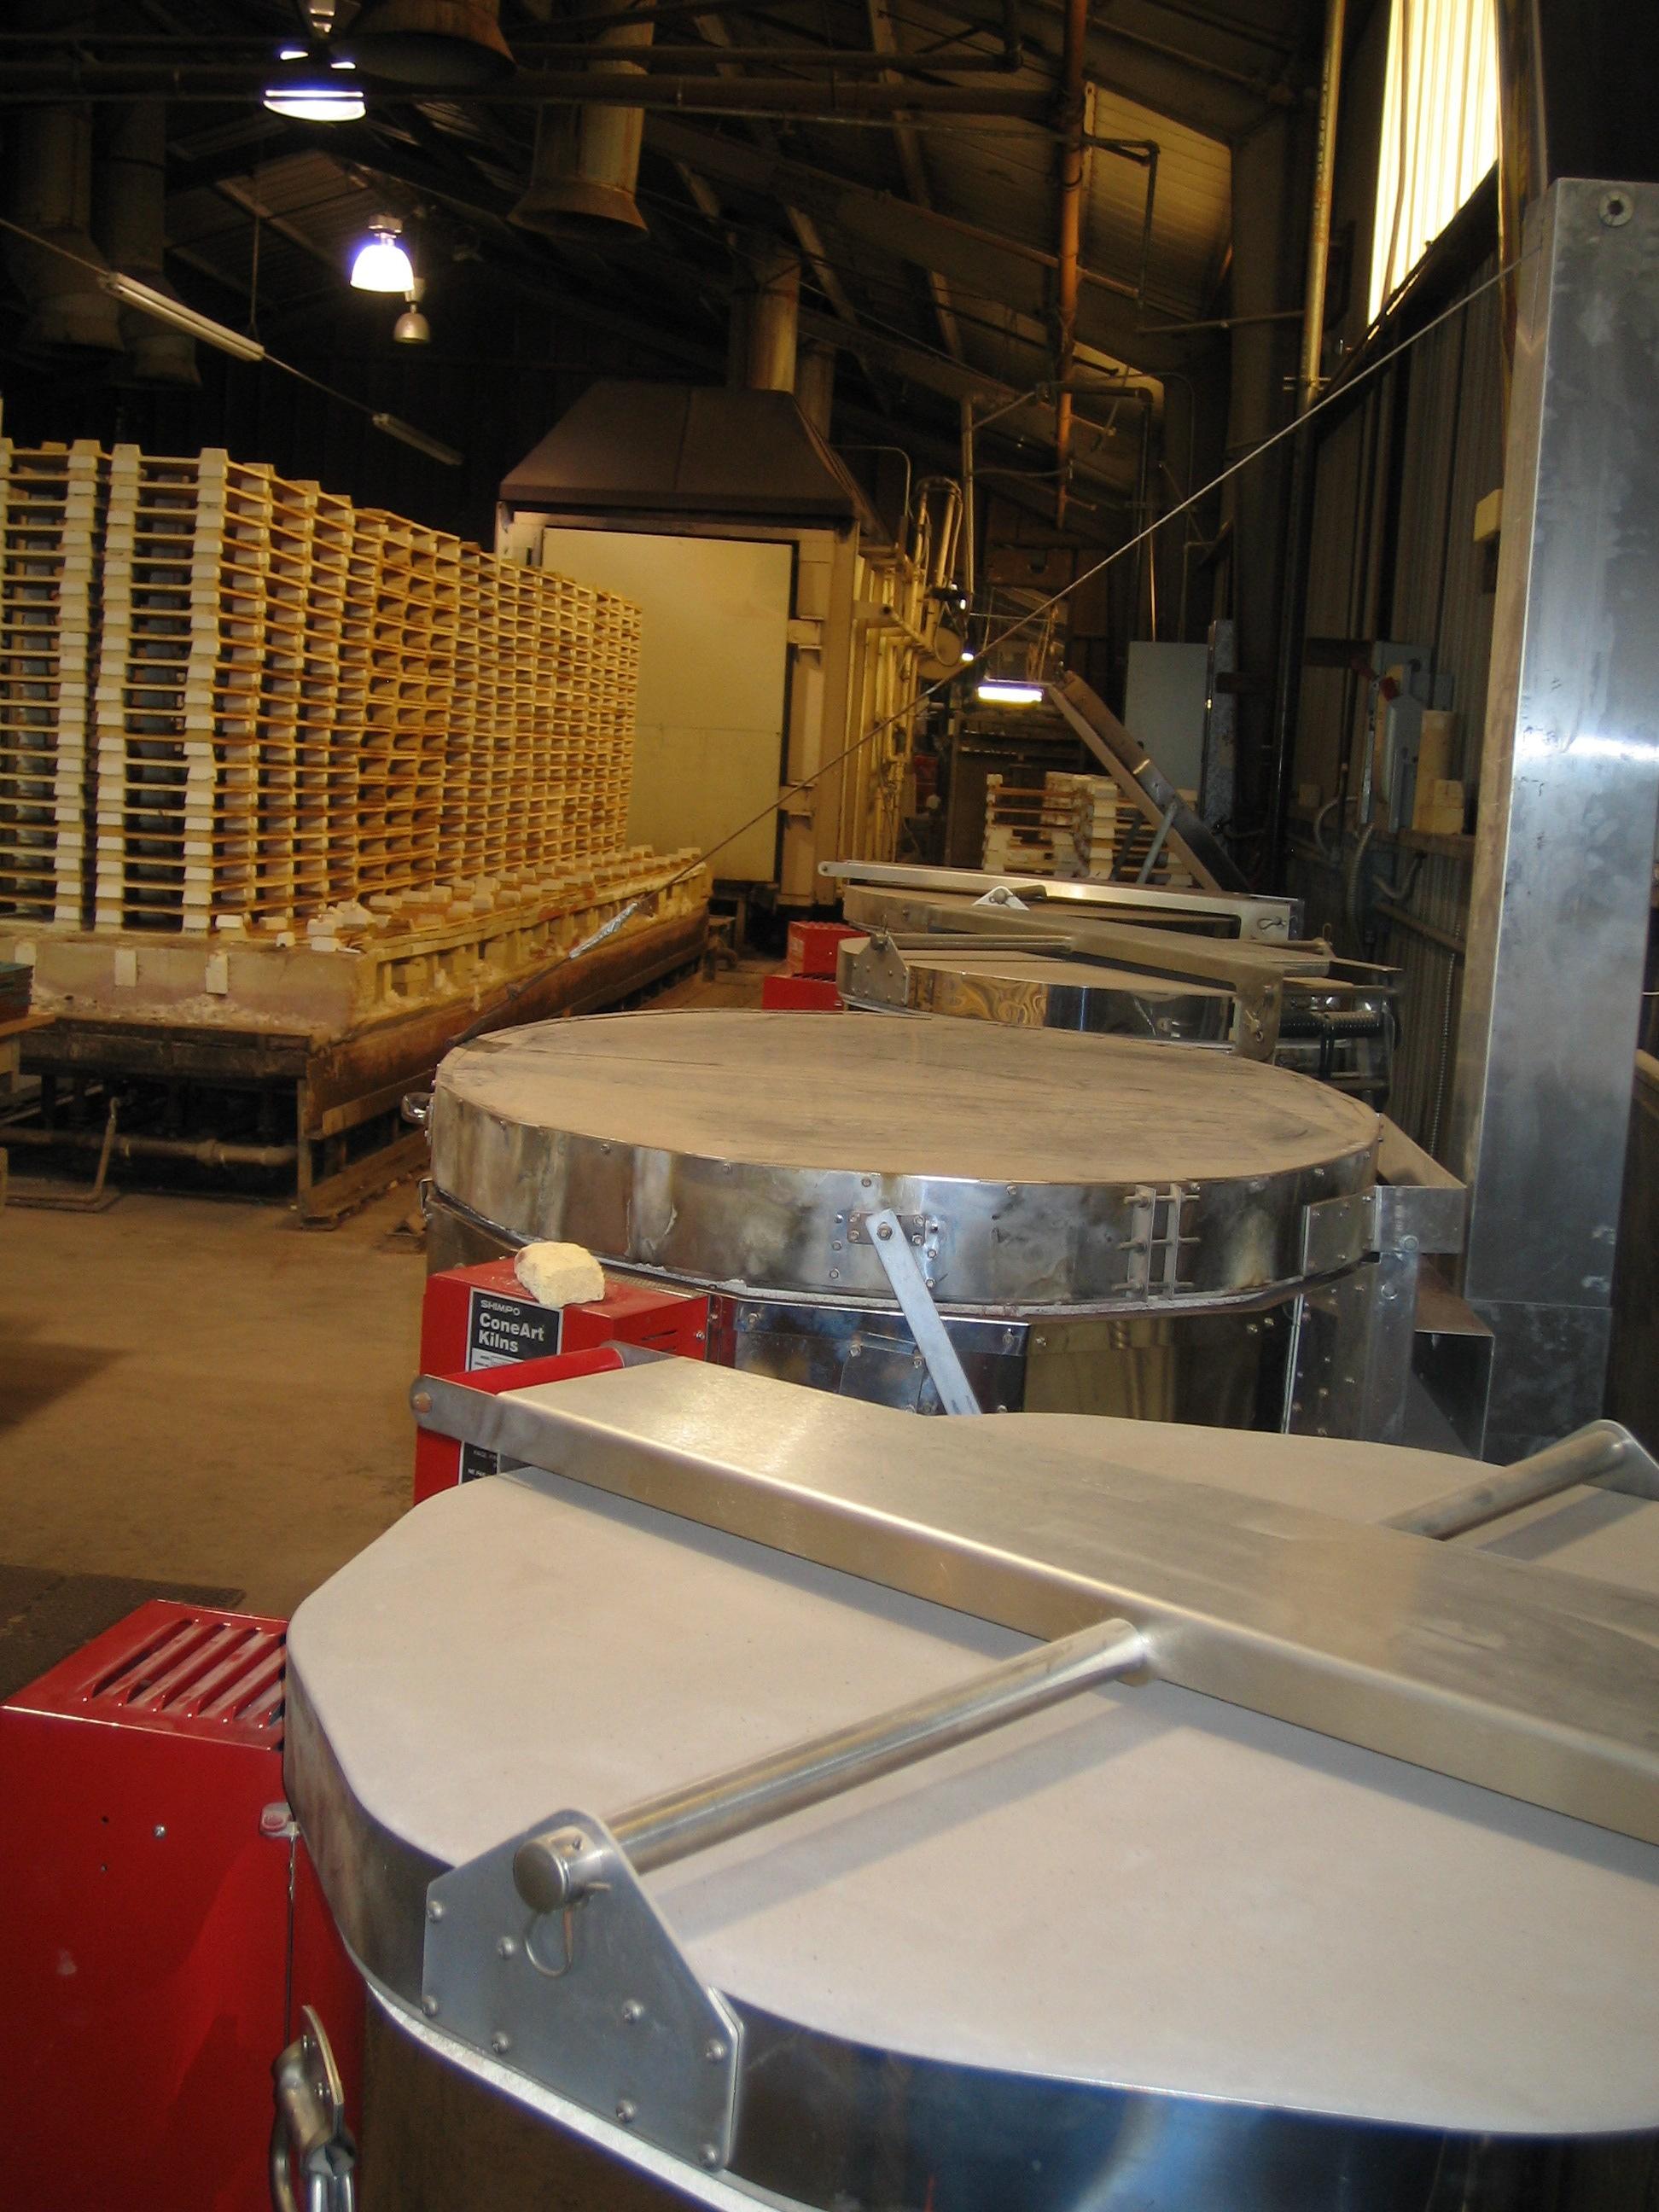 Fileproduction facility for making ceramic tile in long beach ca fileproduction facility for making ceramic tile in long beach cag dailygadgetfo Choice Image